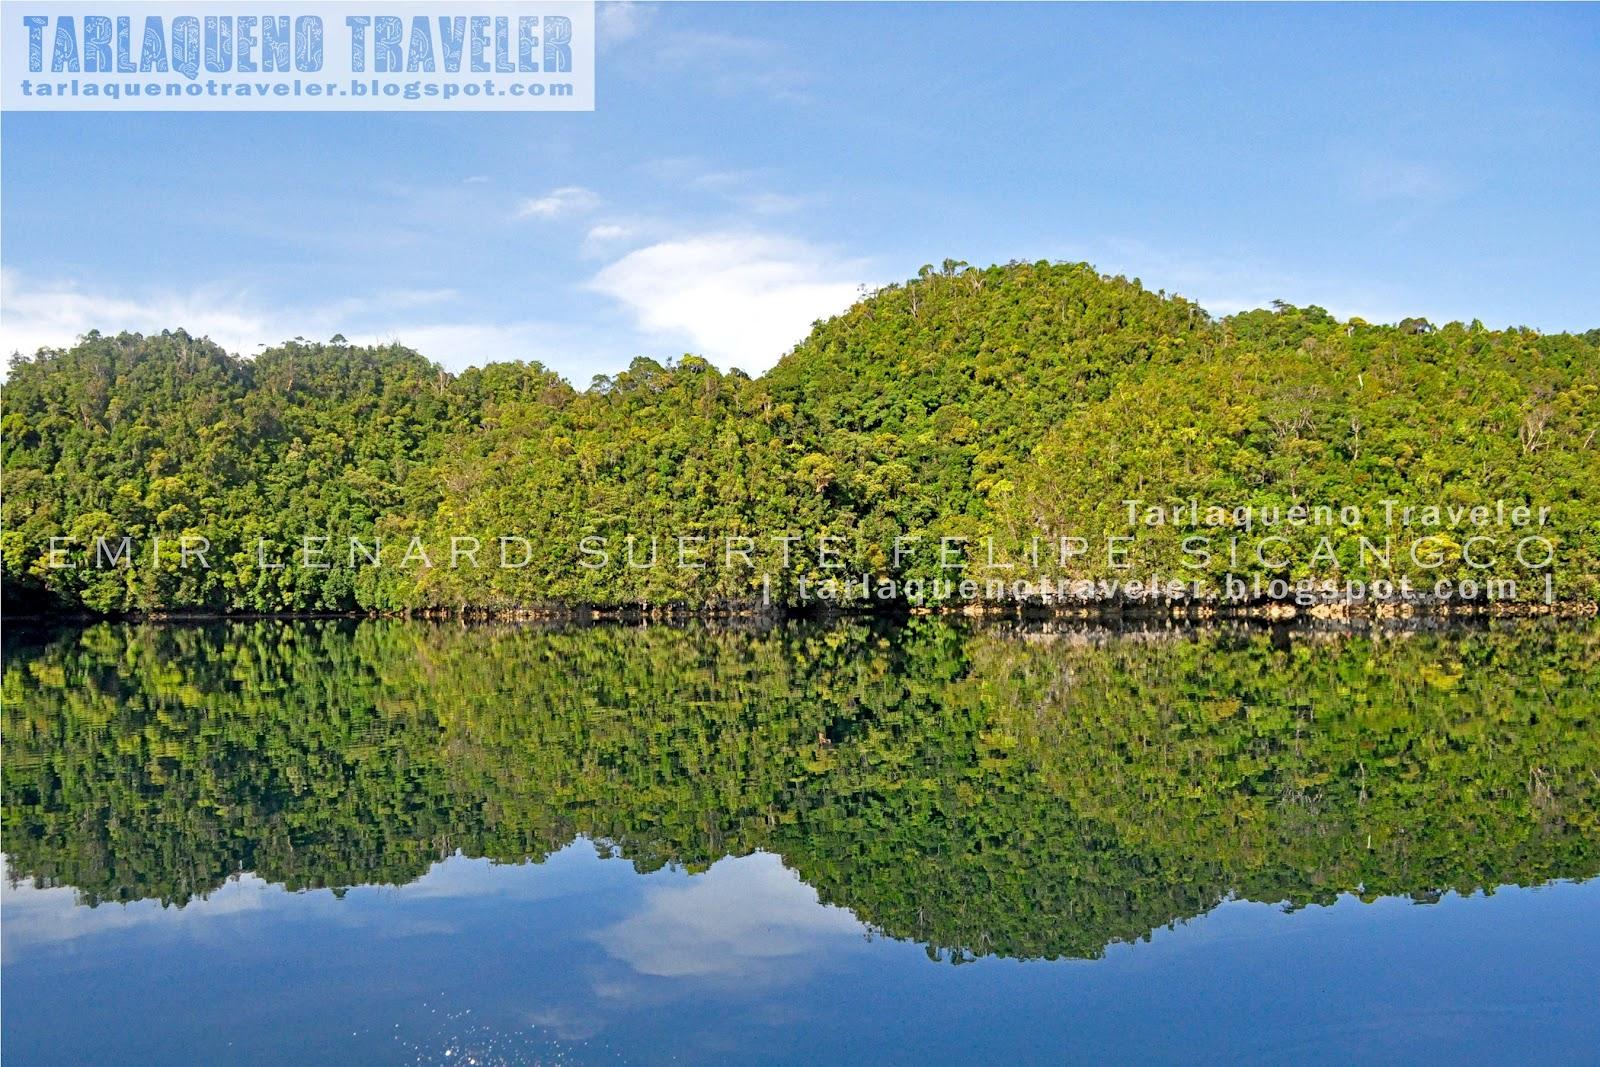 Sohoton Cove